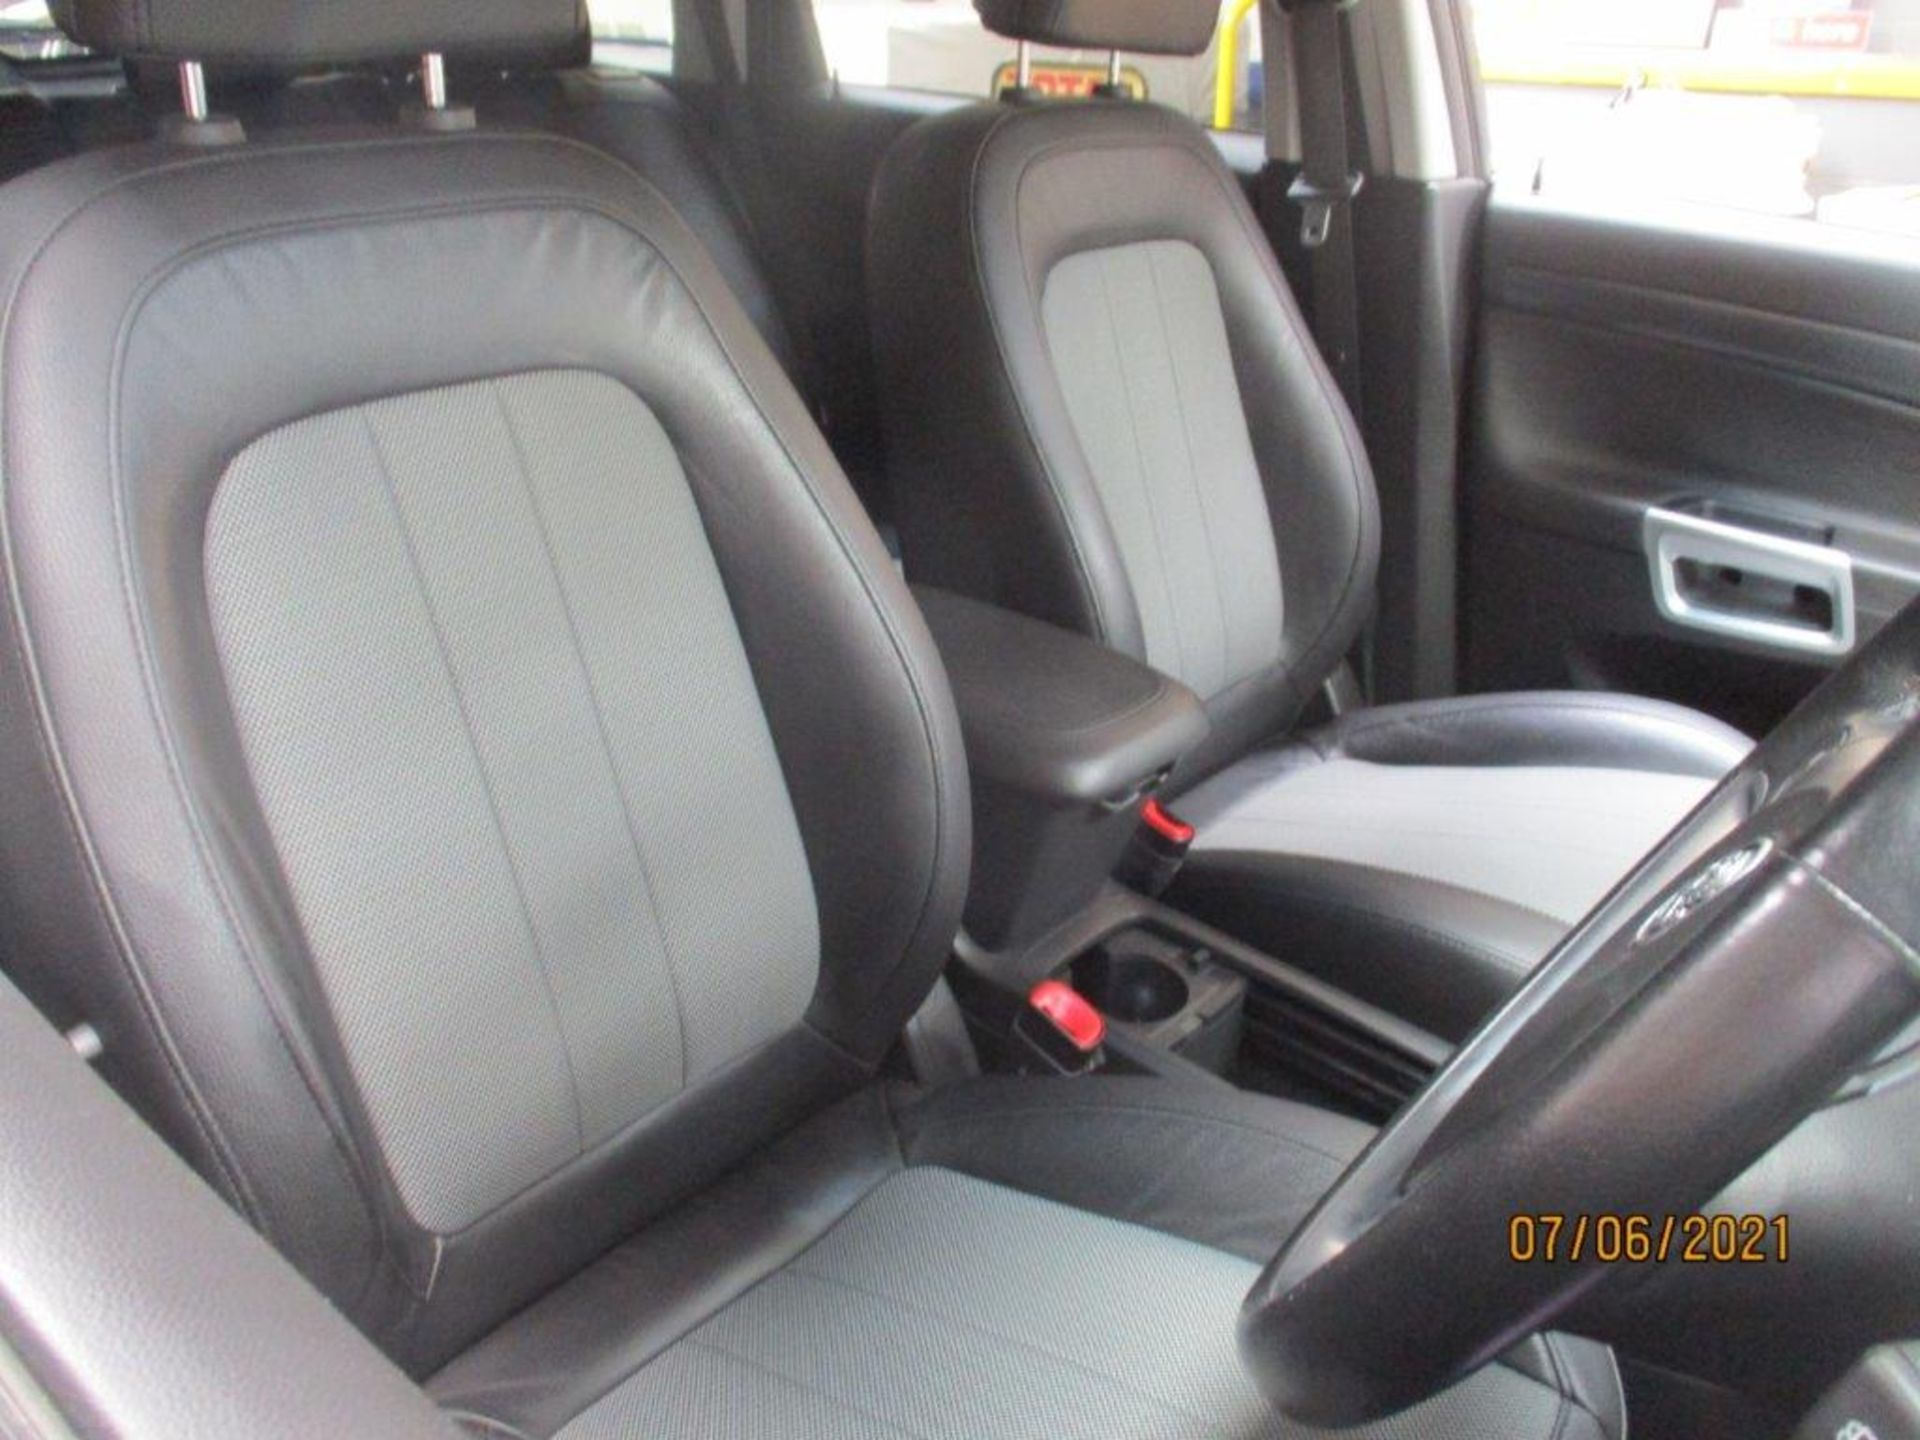 12 12 Vauxhall Antara Excl CDTI - Image 15 of 18